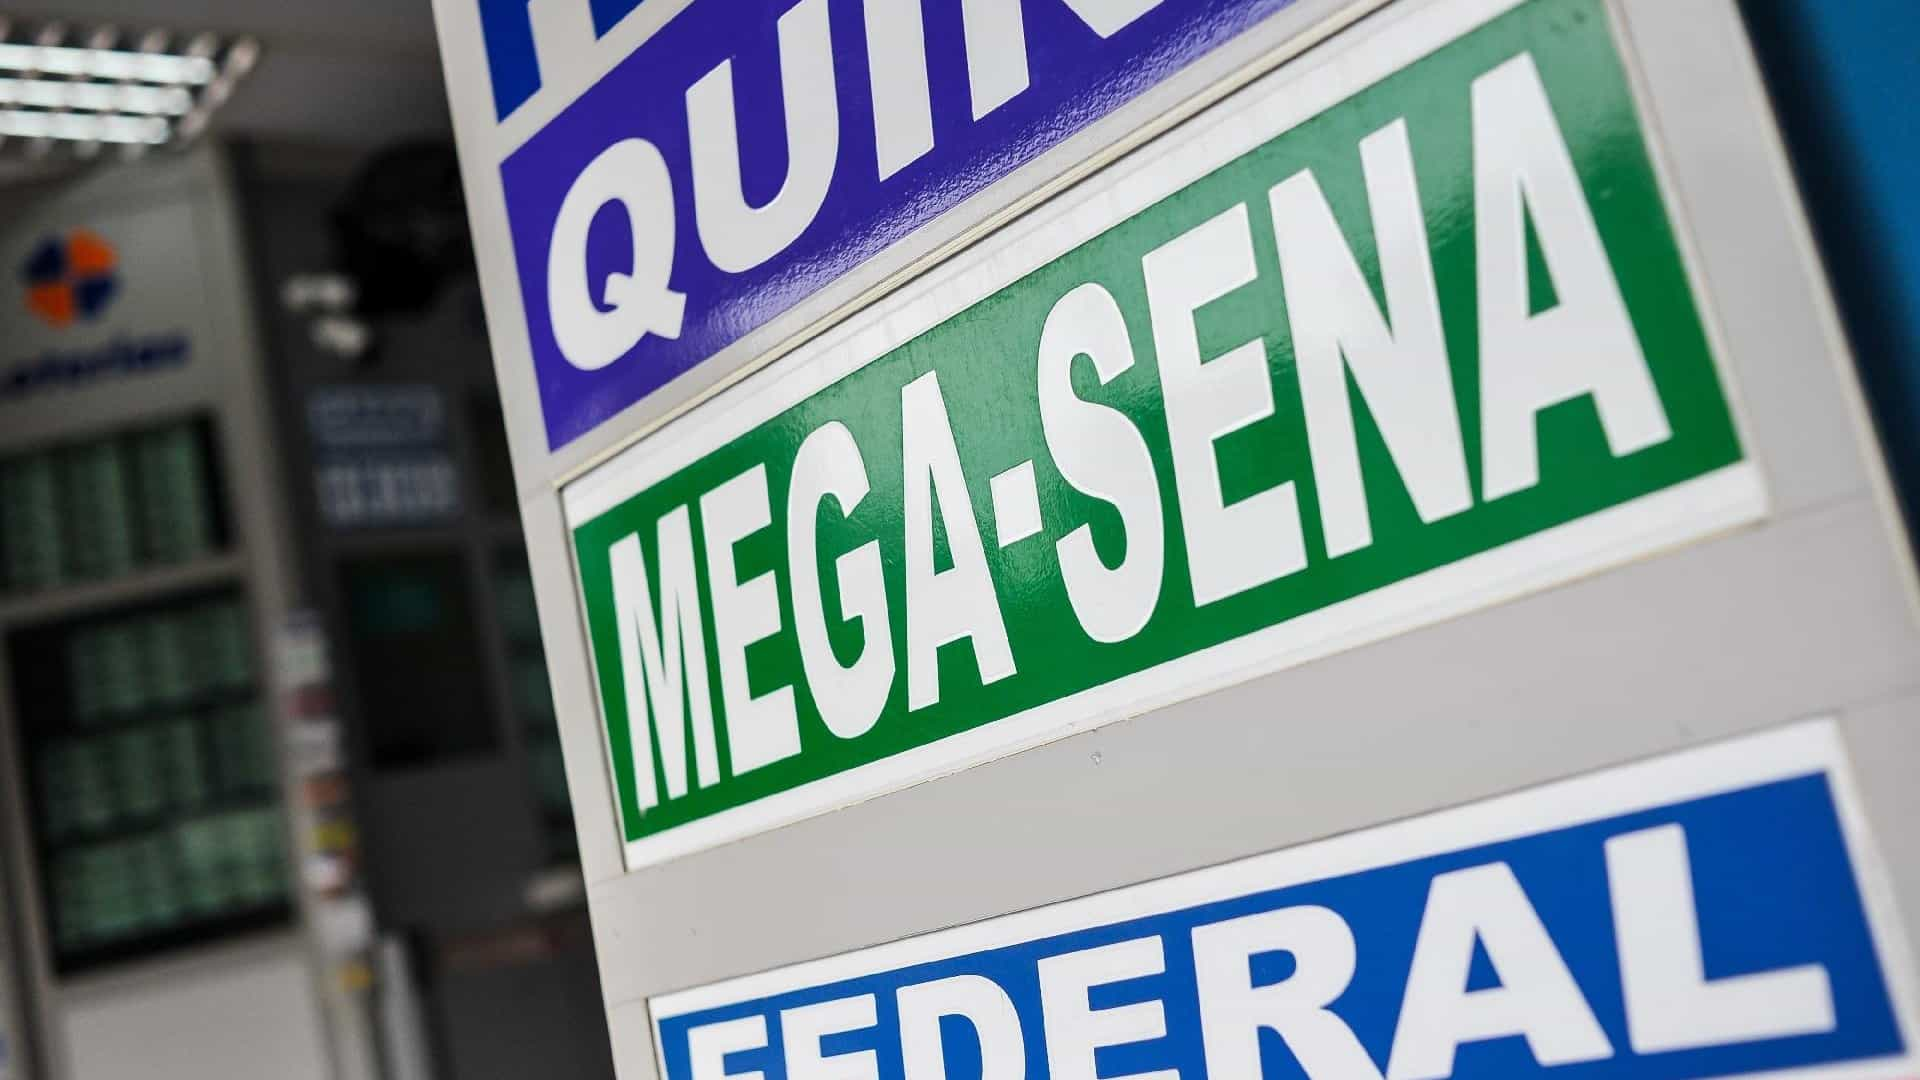 Caixa suspende Loteria Federal e altera sorteio da Dupla de Páscoa